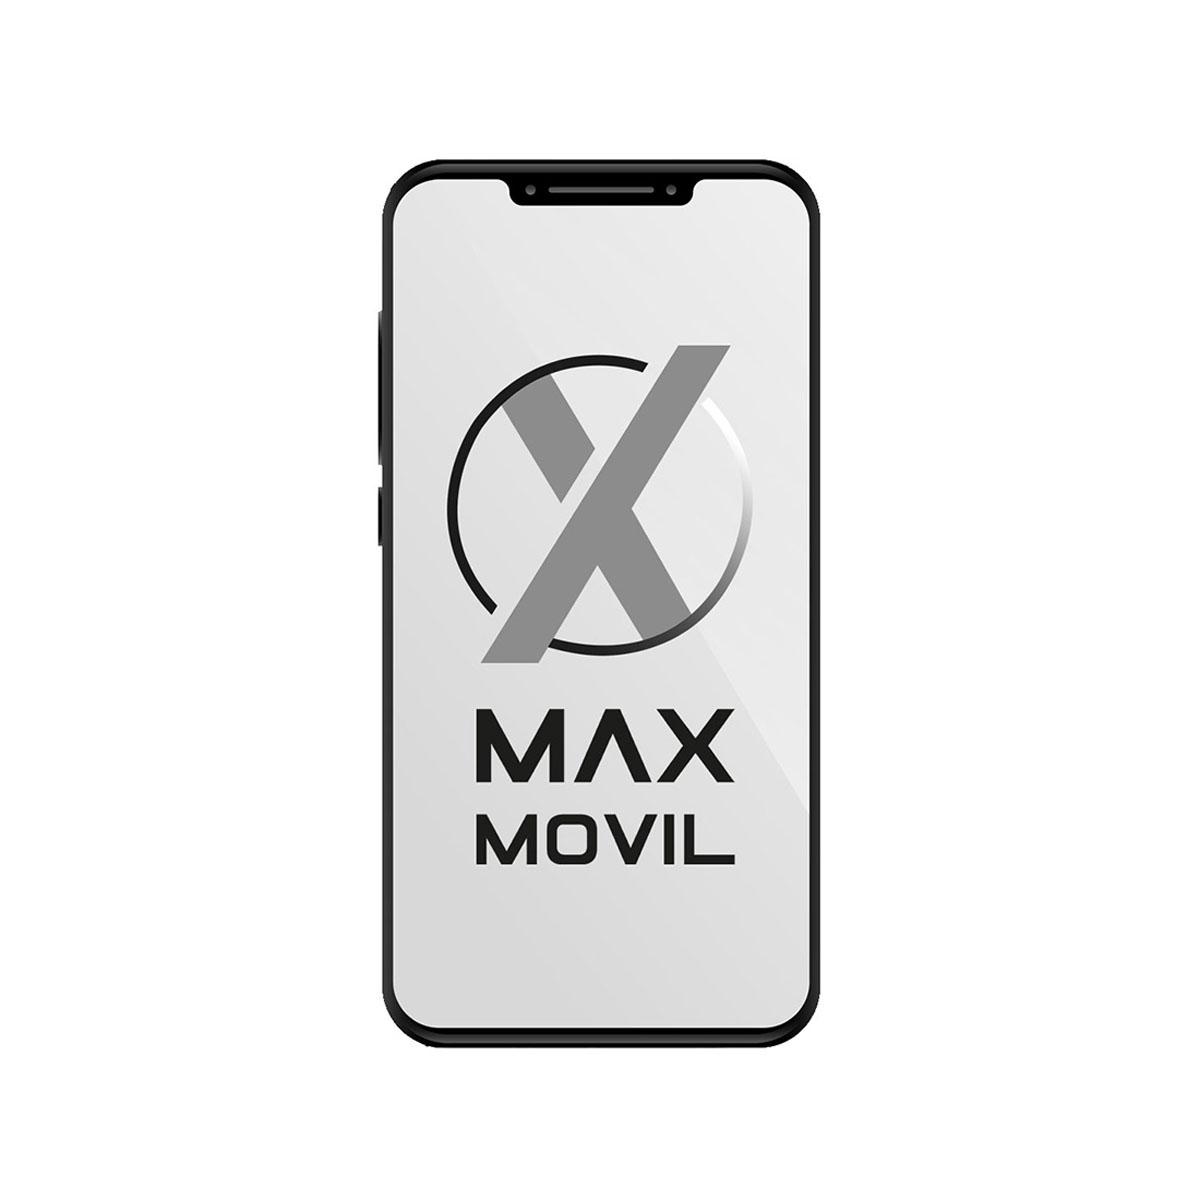 SanDisk Extreme 64GB SDXC - Tarjeta de memoria 150MB/s